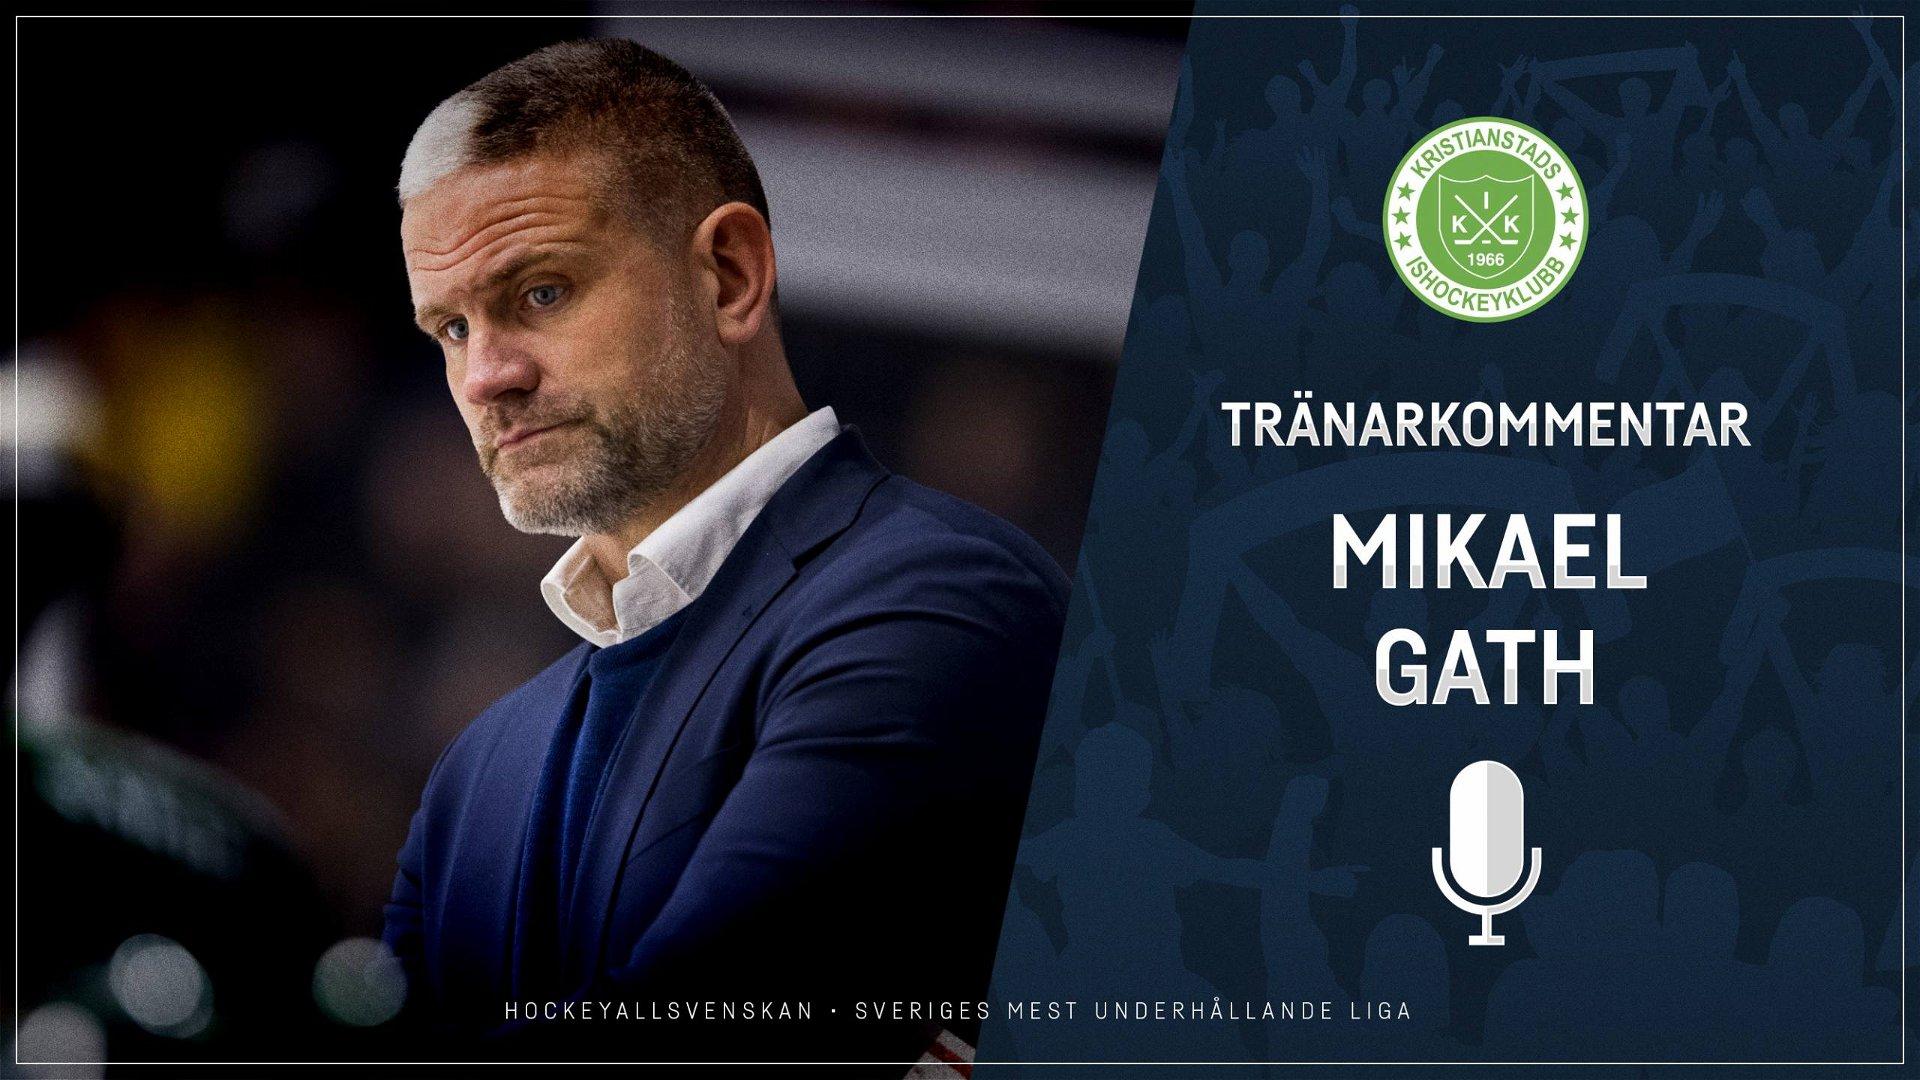 2020-10-24 Segerintervju: Mikael Gath